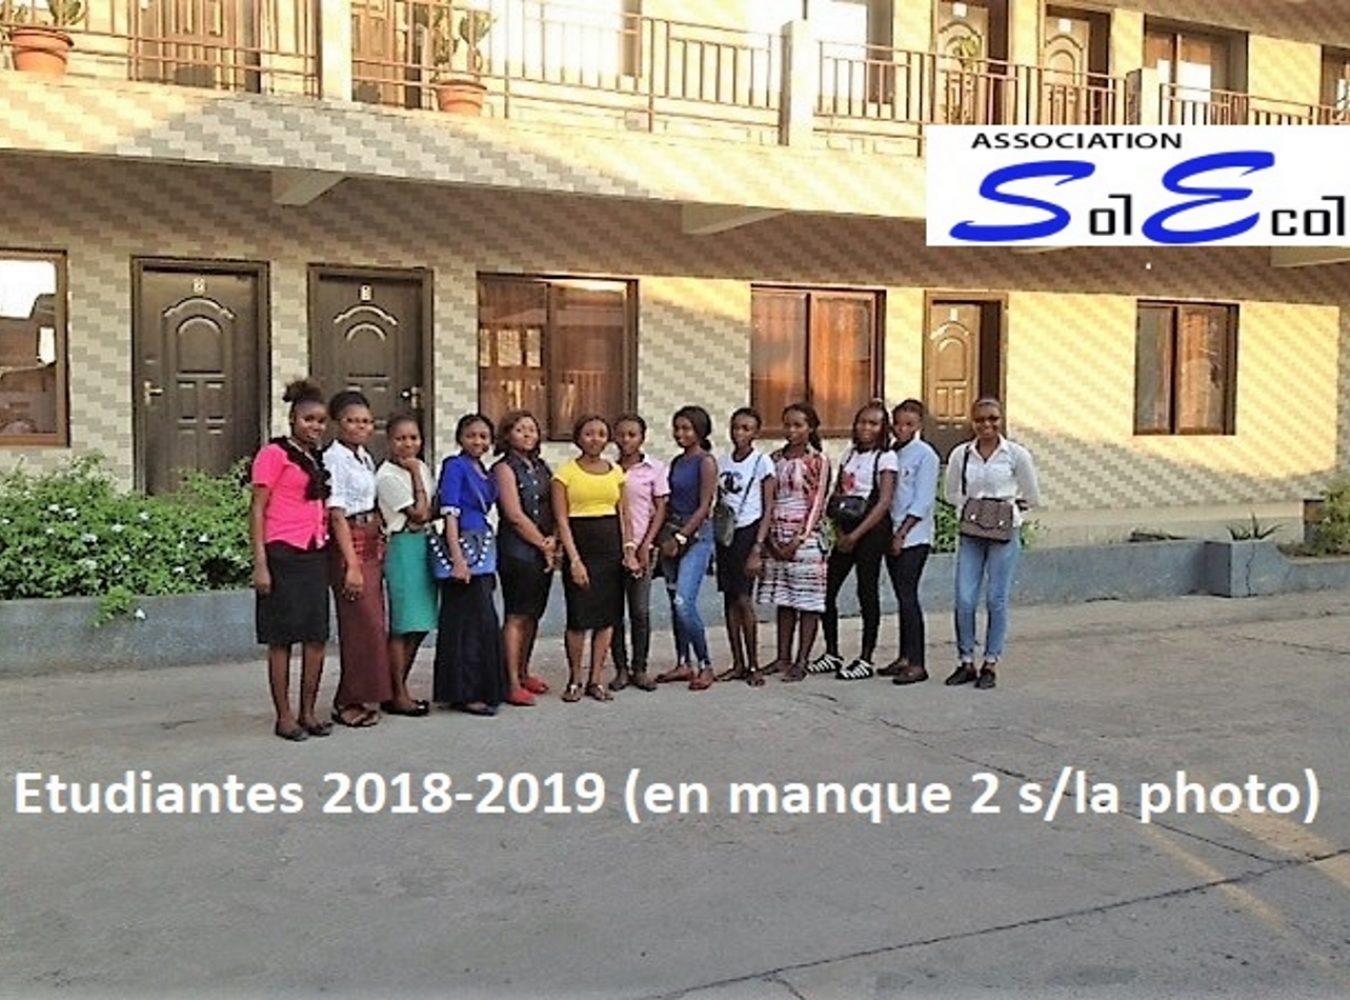 EtudiantesRentree2018-2019